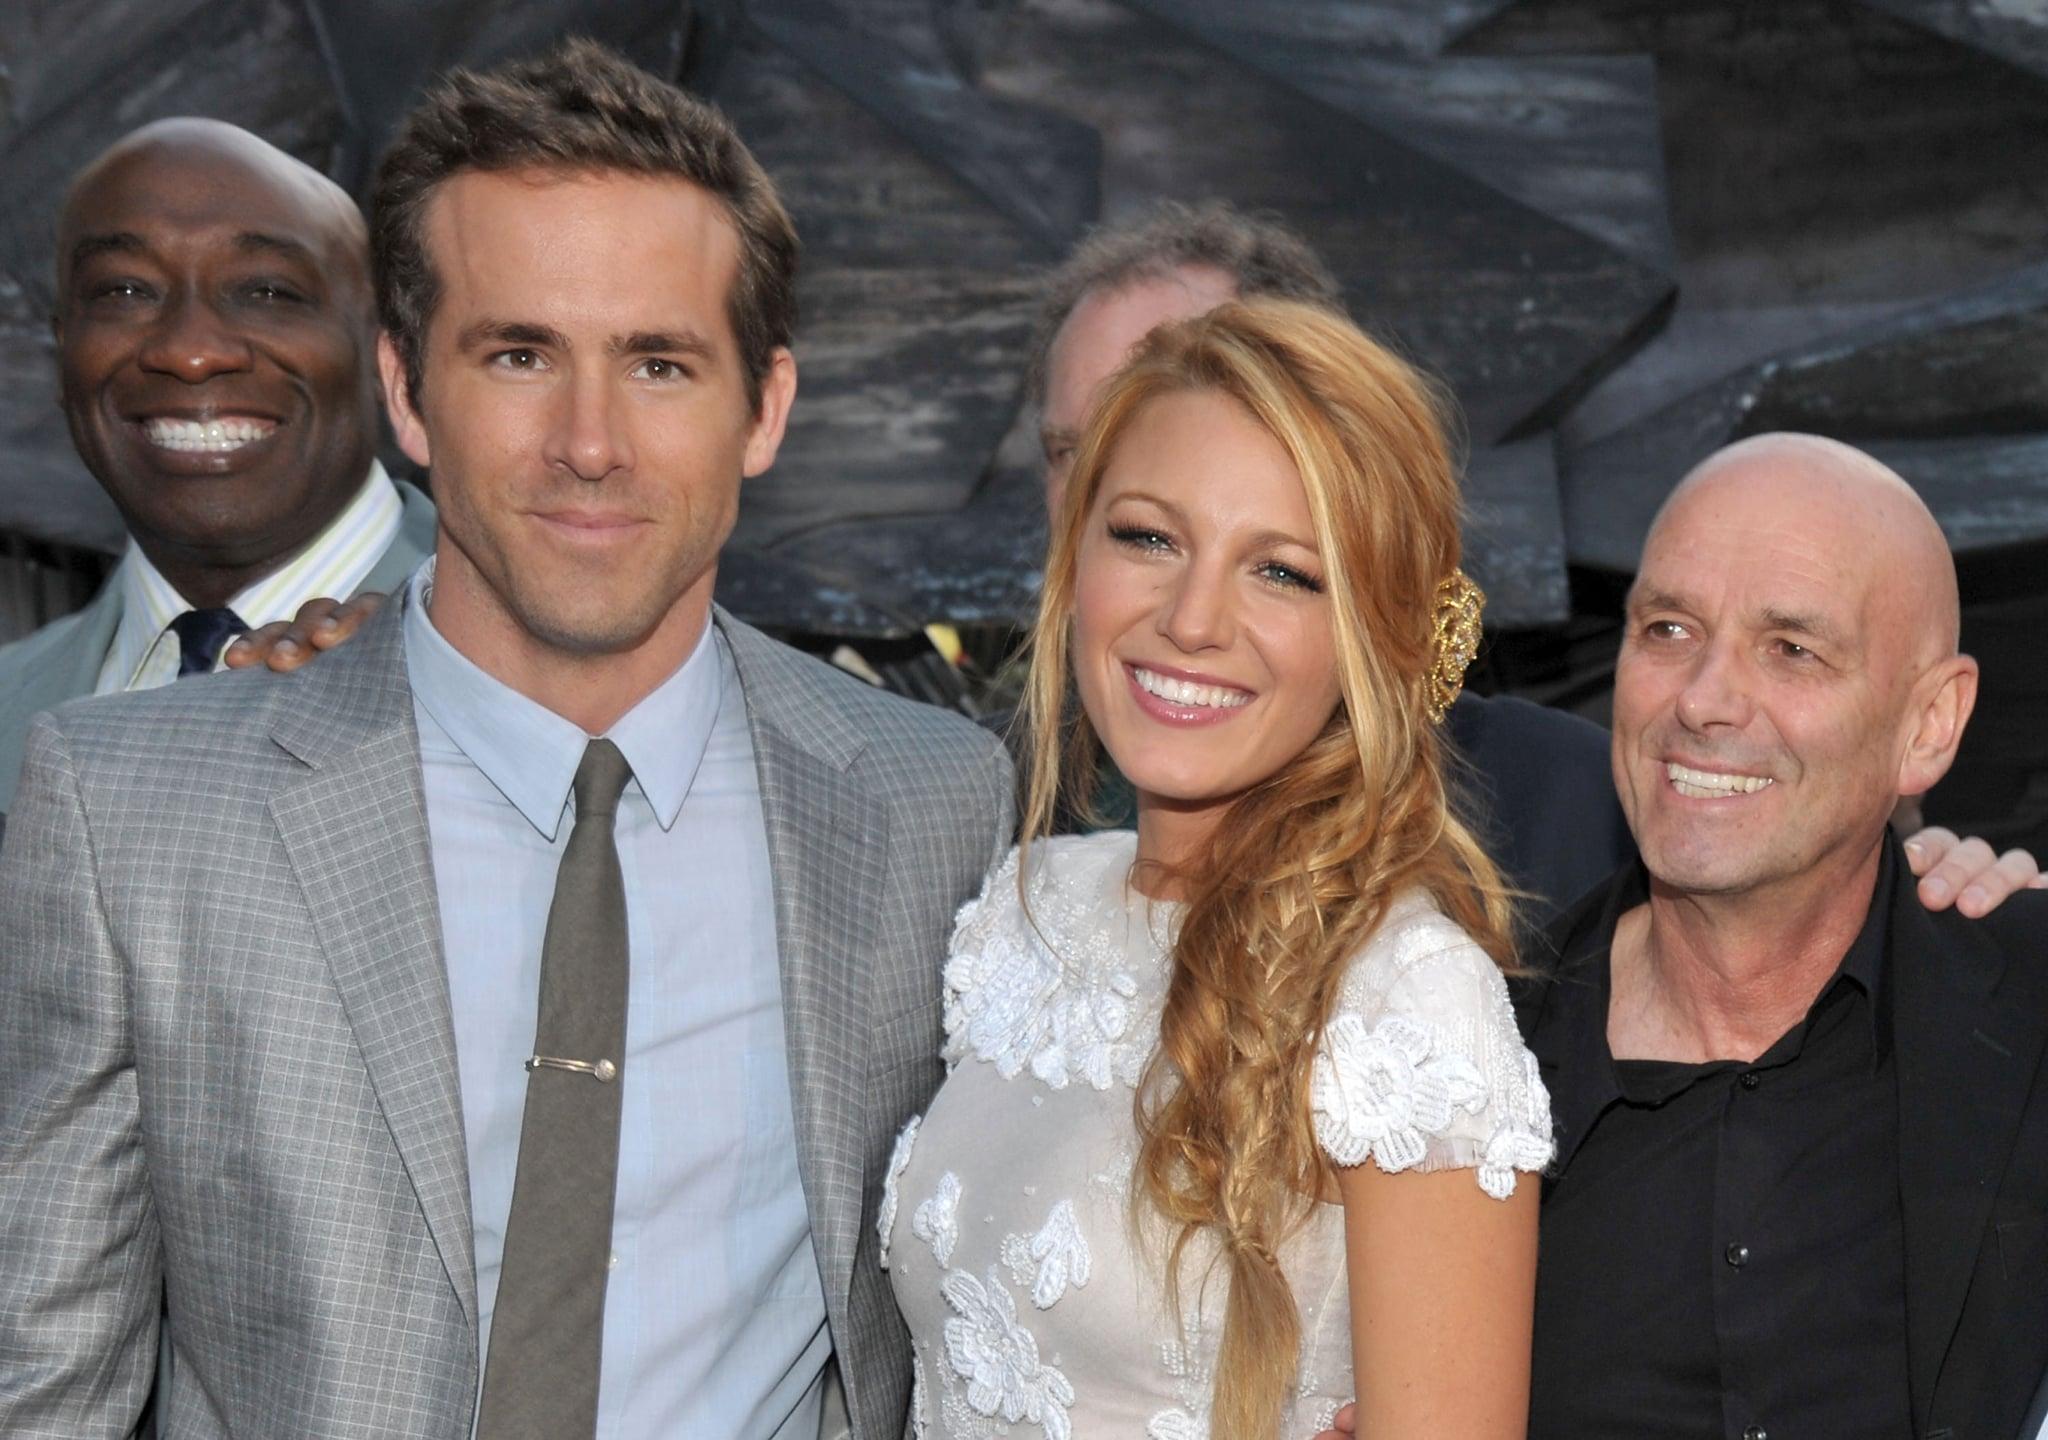 When She Costared in Green Lantern With Ryan Reynolds